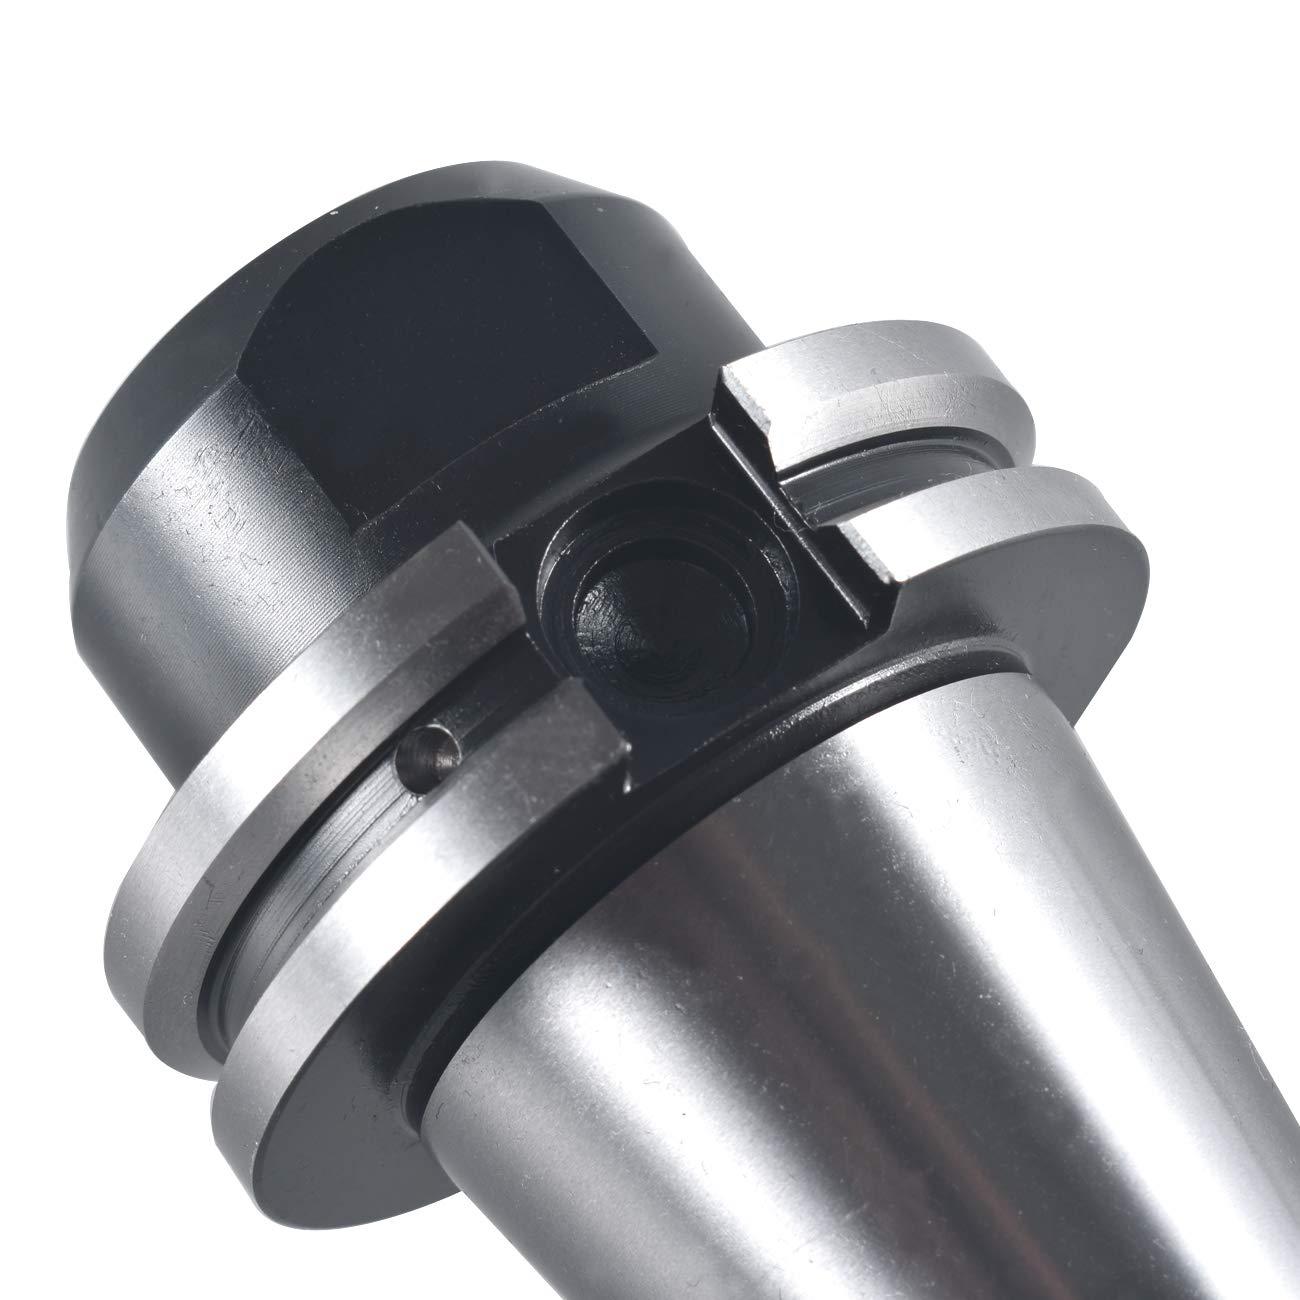 CAT 40 7//8 x 1.75 End Mill Tool Holder Balanced G2.5 20000 RPM USA